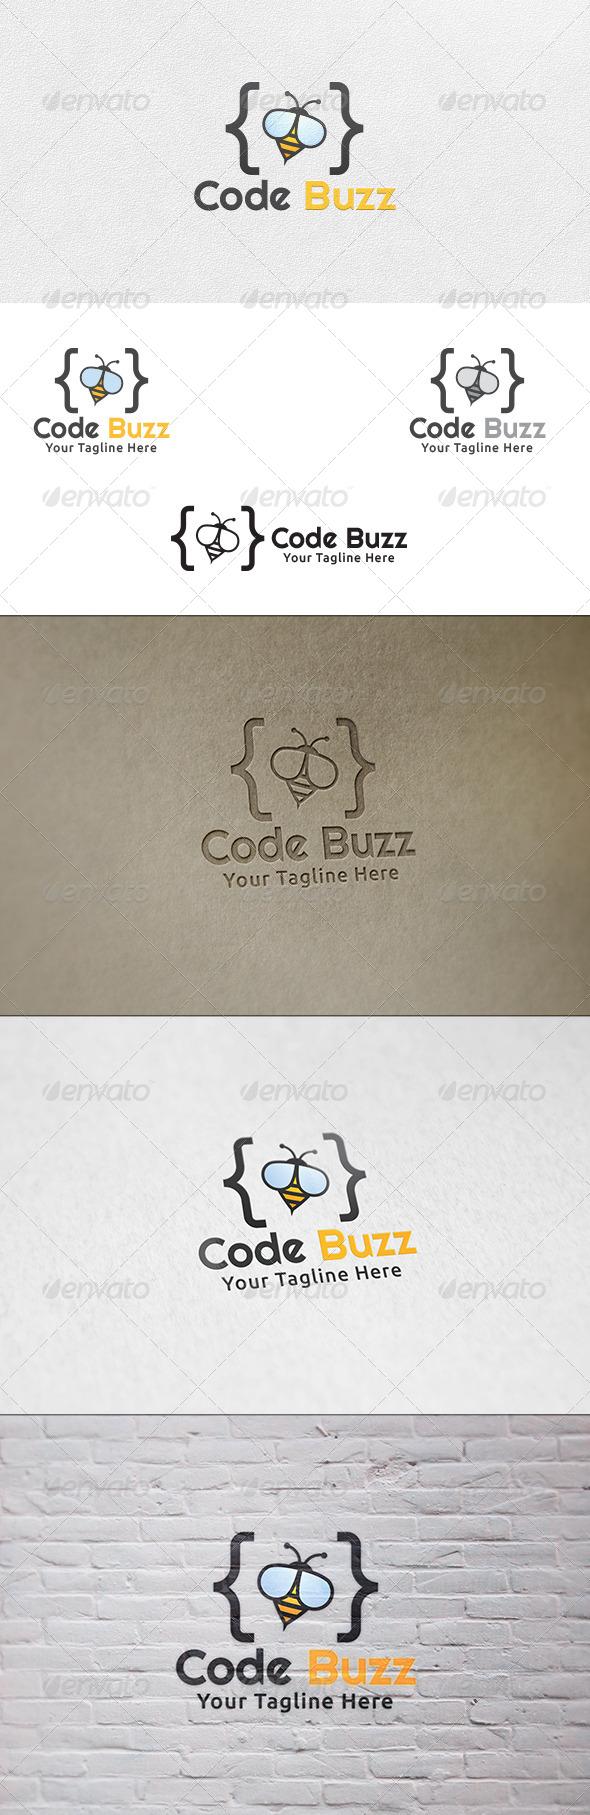 GraphicRiver Code Buzz Logo Template 6553607